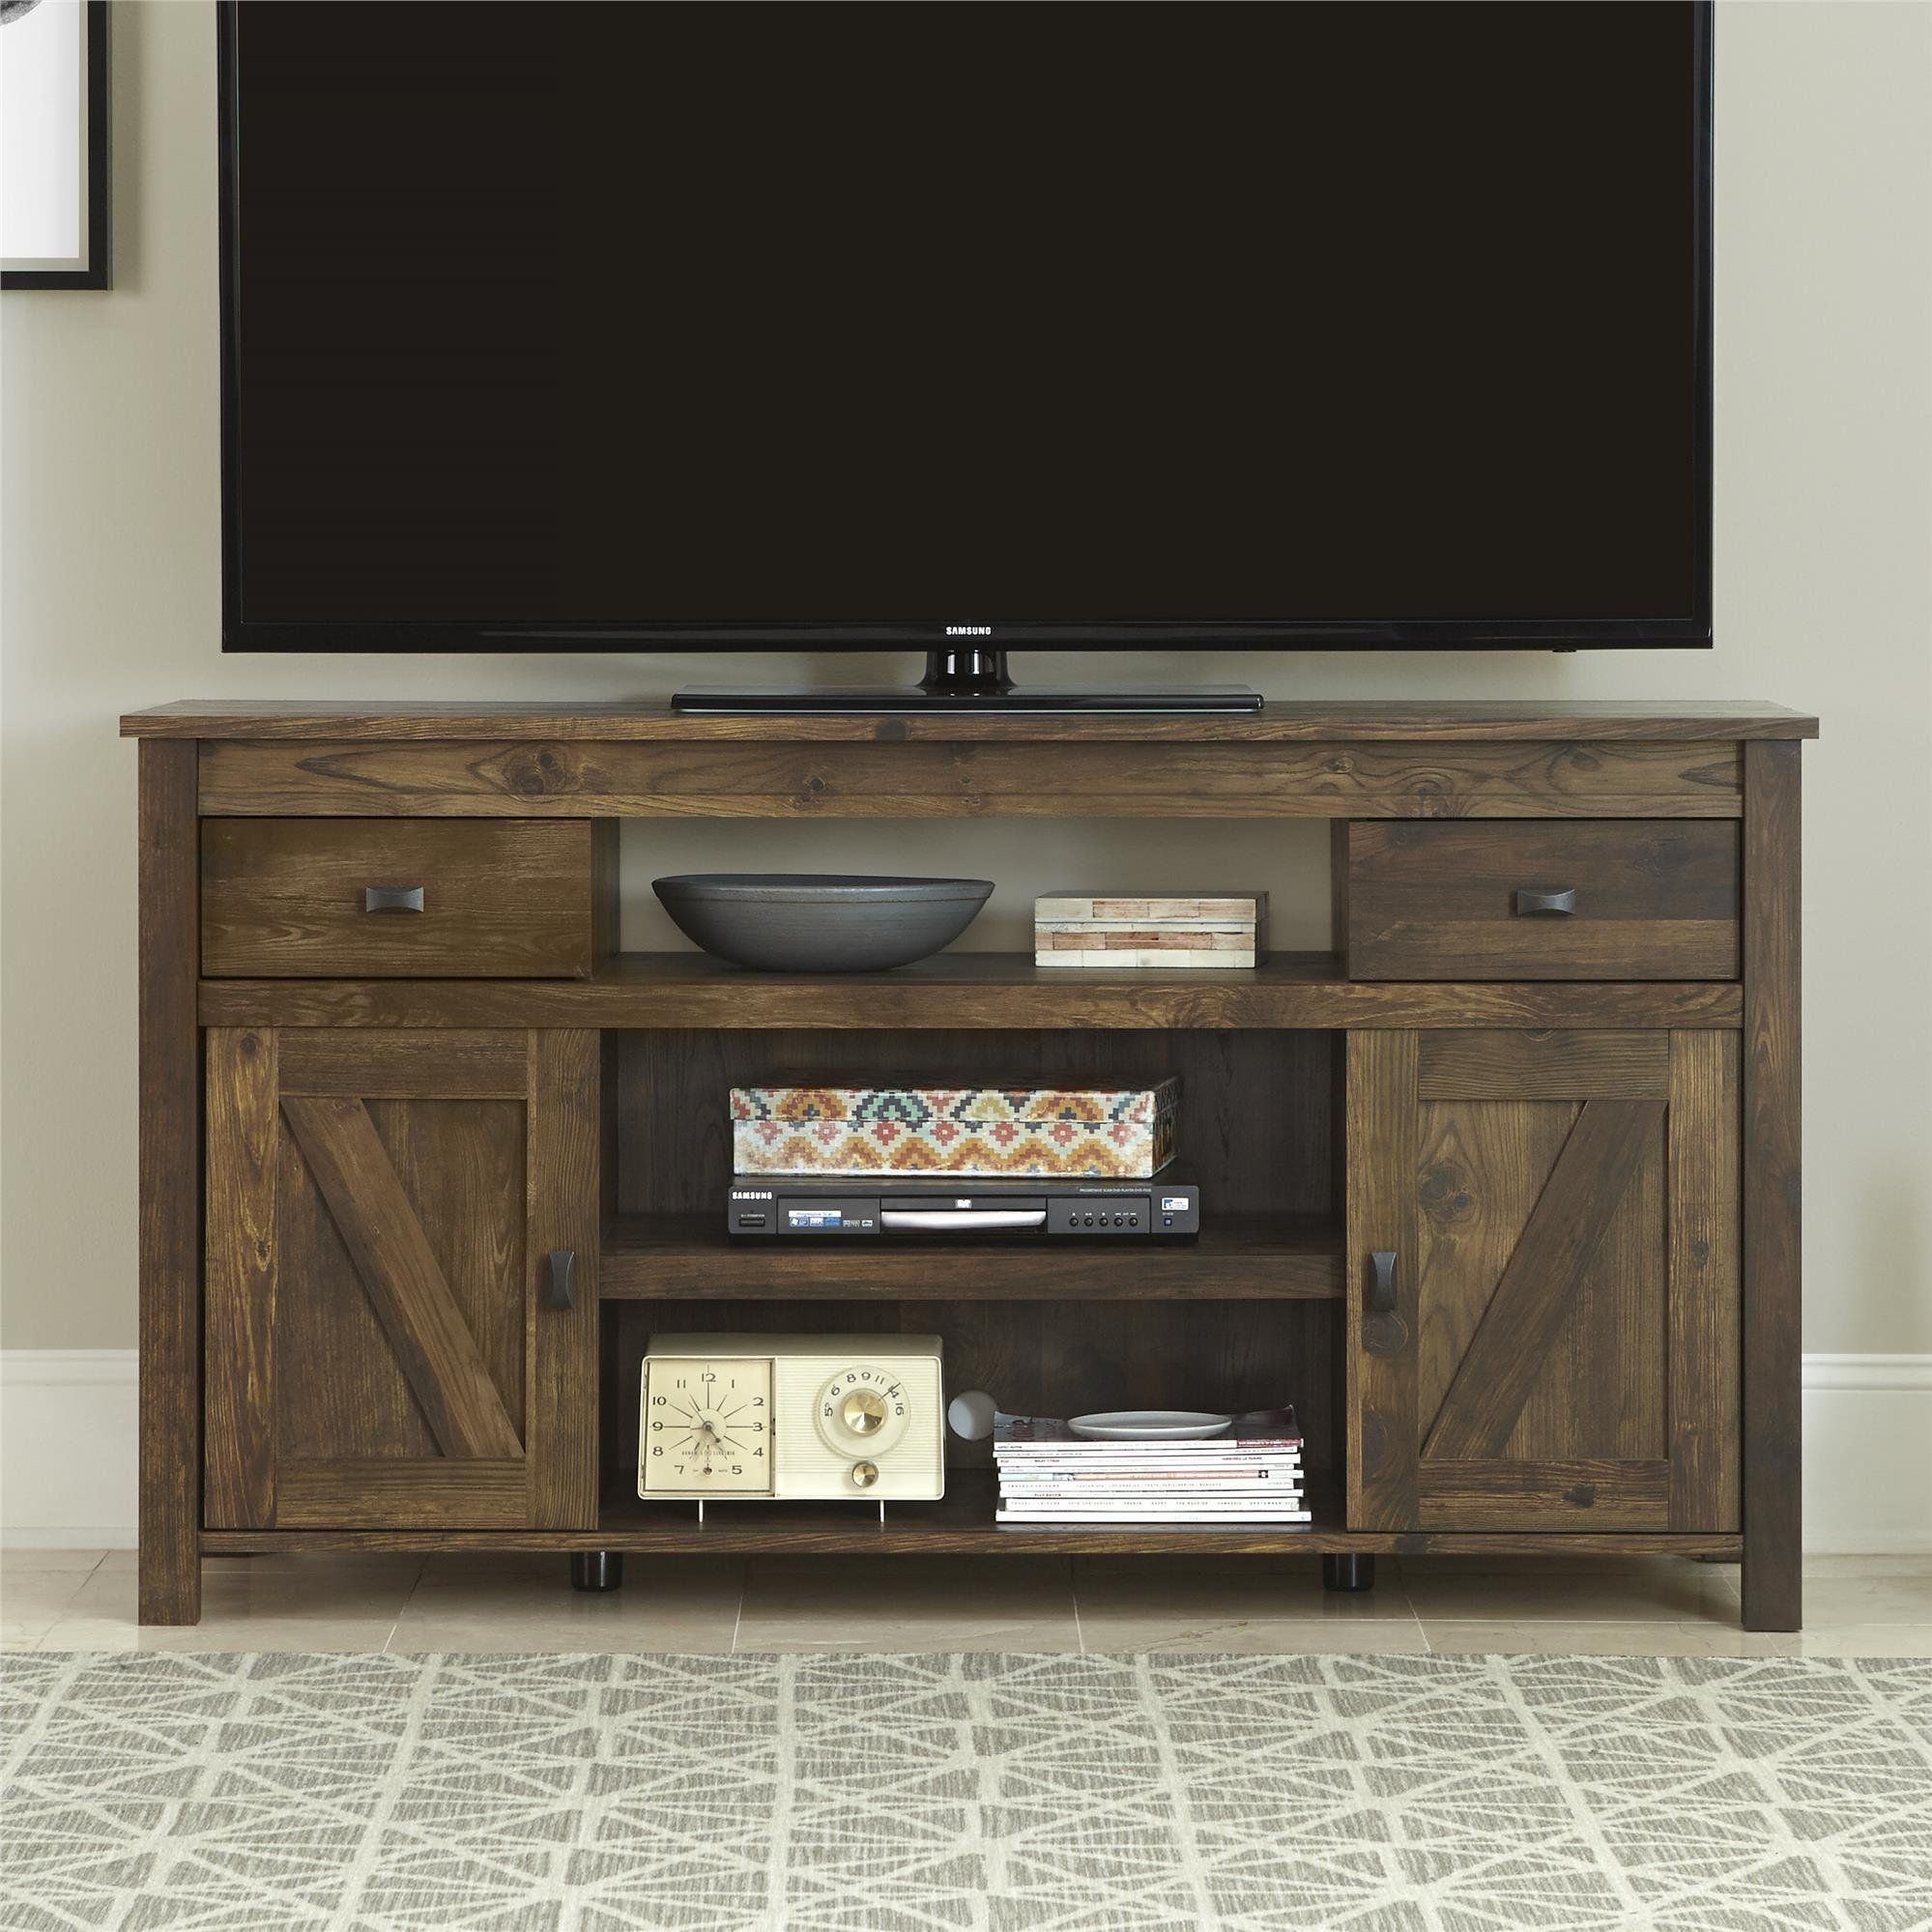 belham living hampton tv stand - white/oak | tv stands, dressers